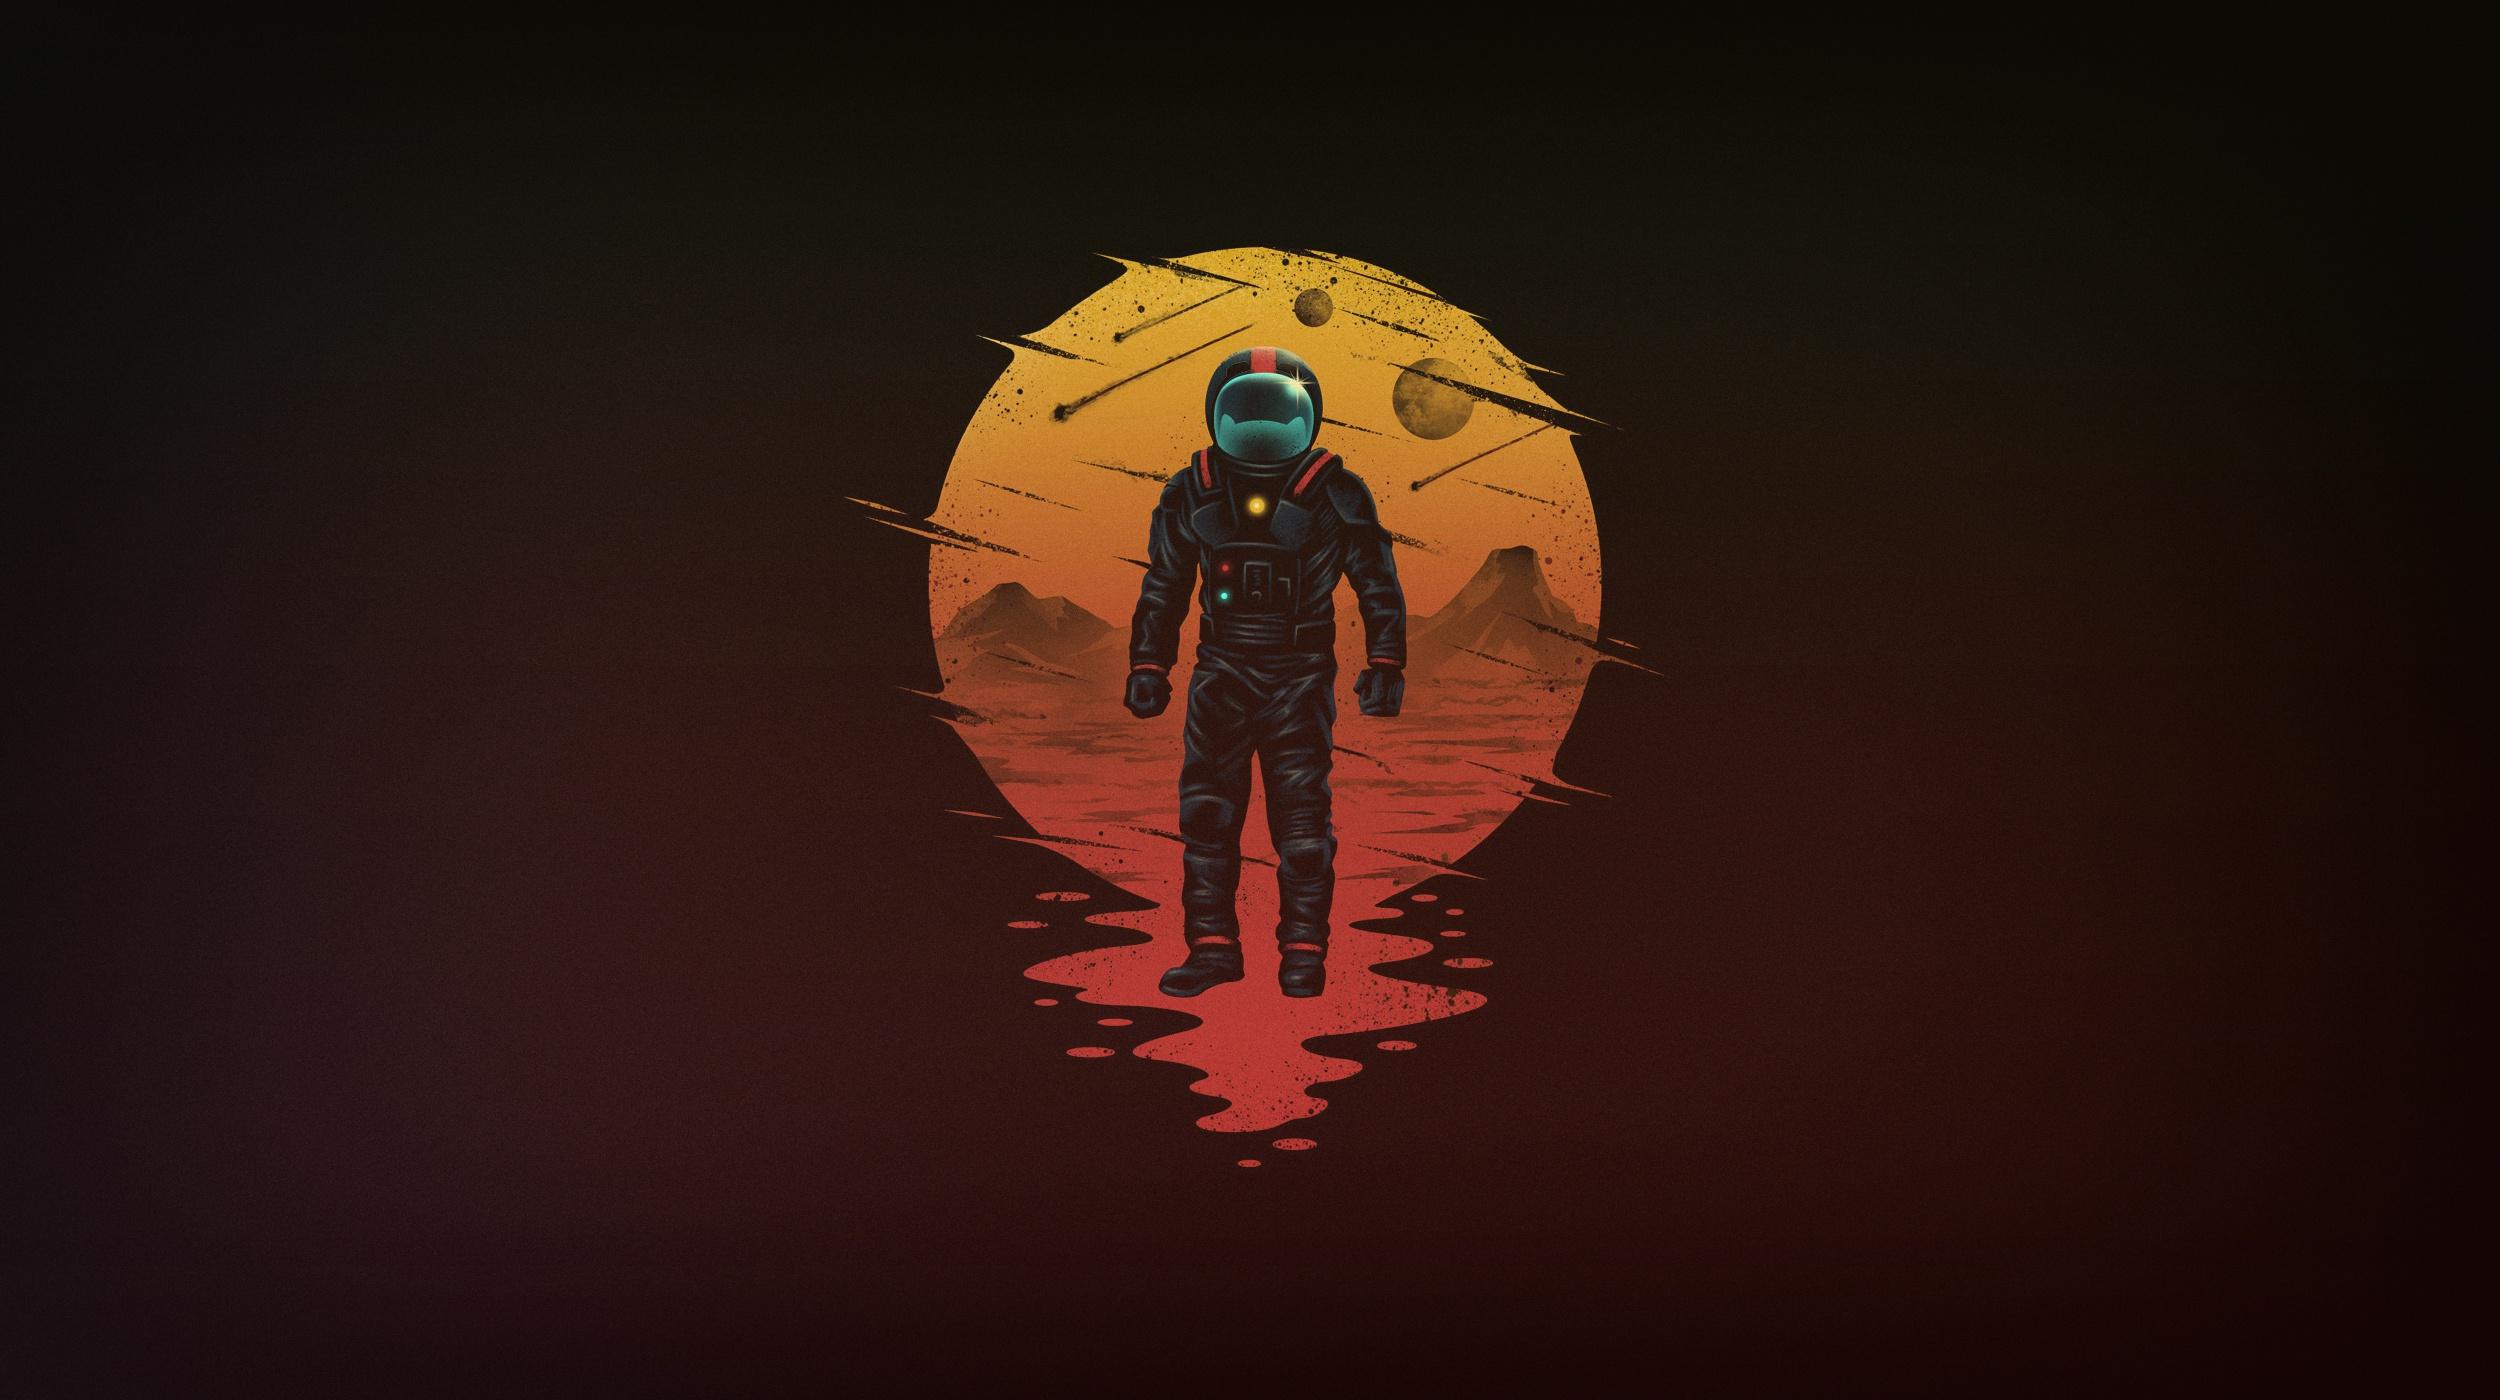 Astronaut Space Space Art, HD Artist, 4k Wallpapers ...